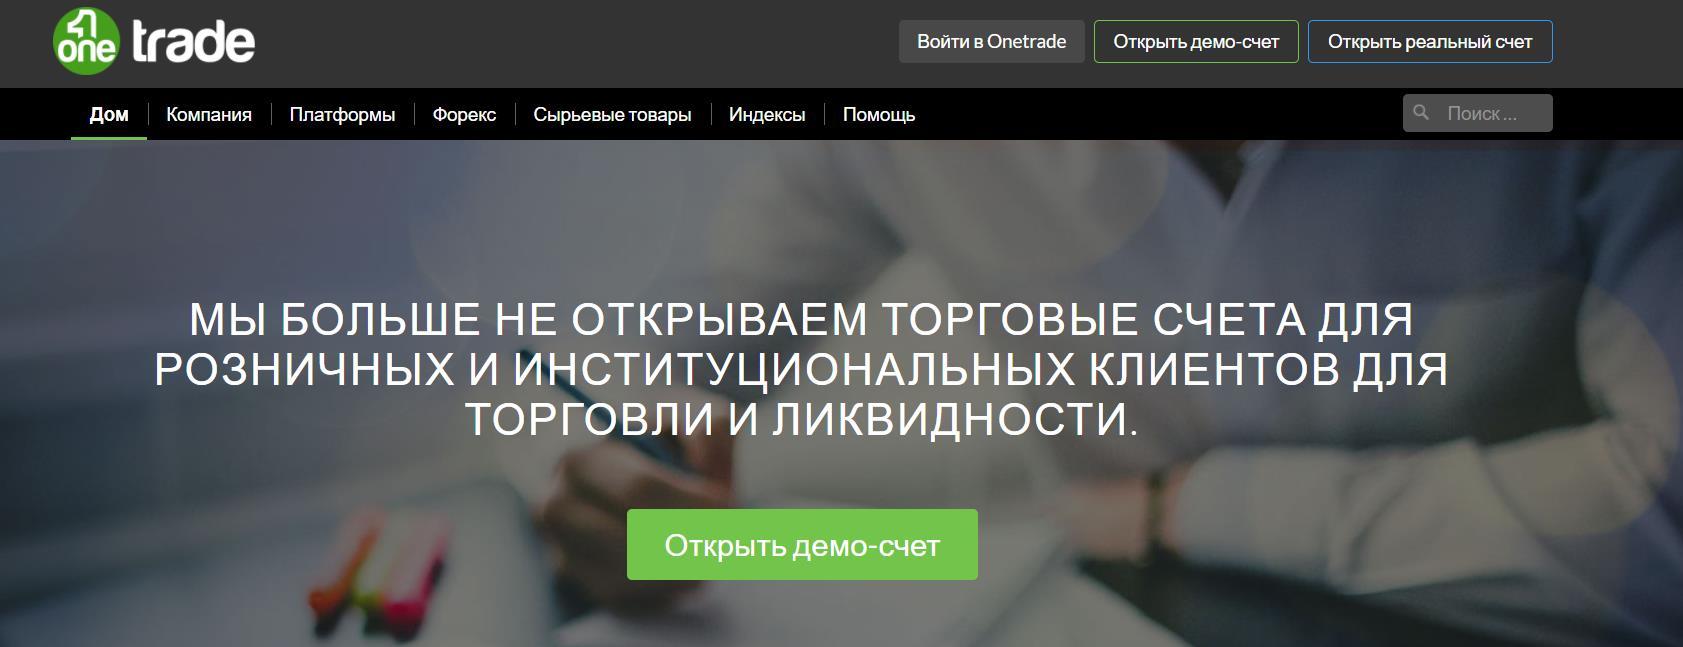 сайт брокерской компании onetrade